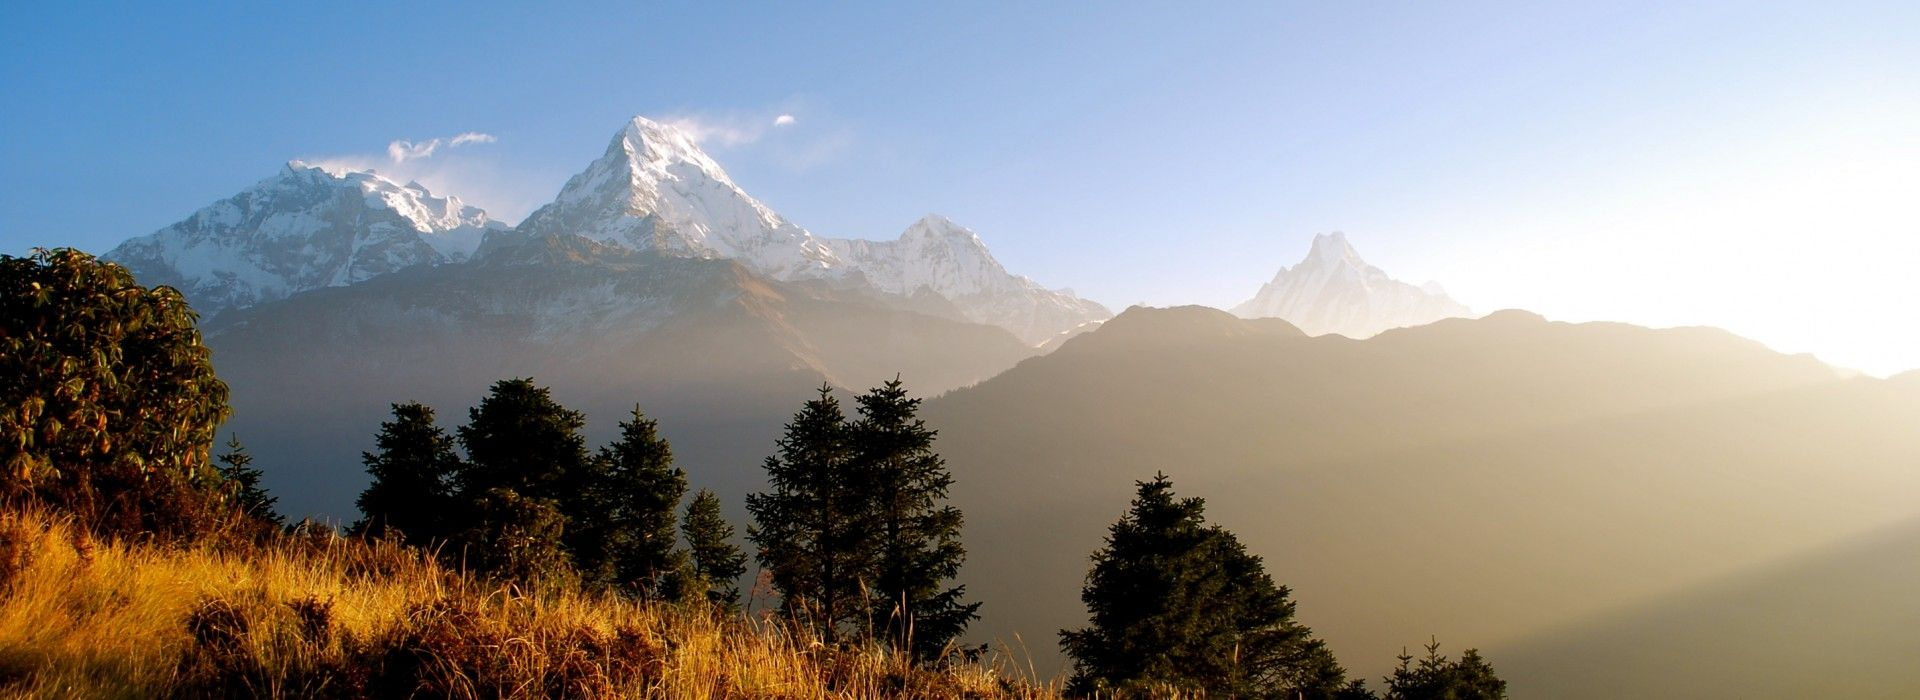 Trekking Tours in Upper Dolpo trek